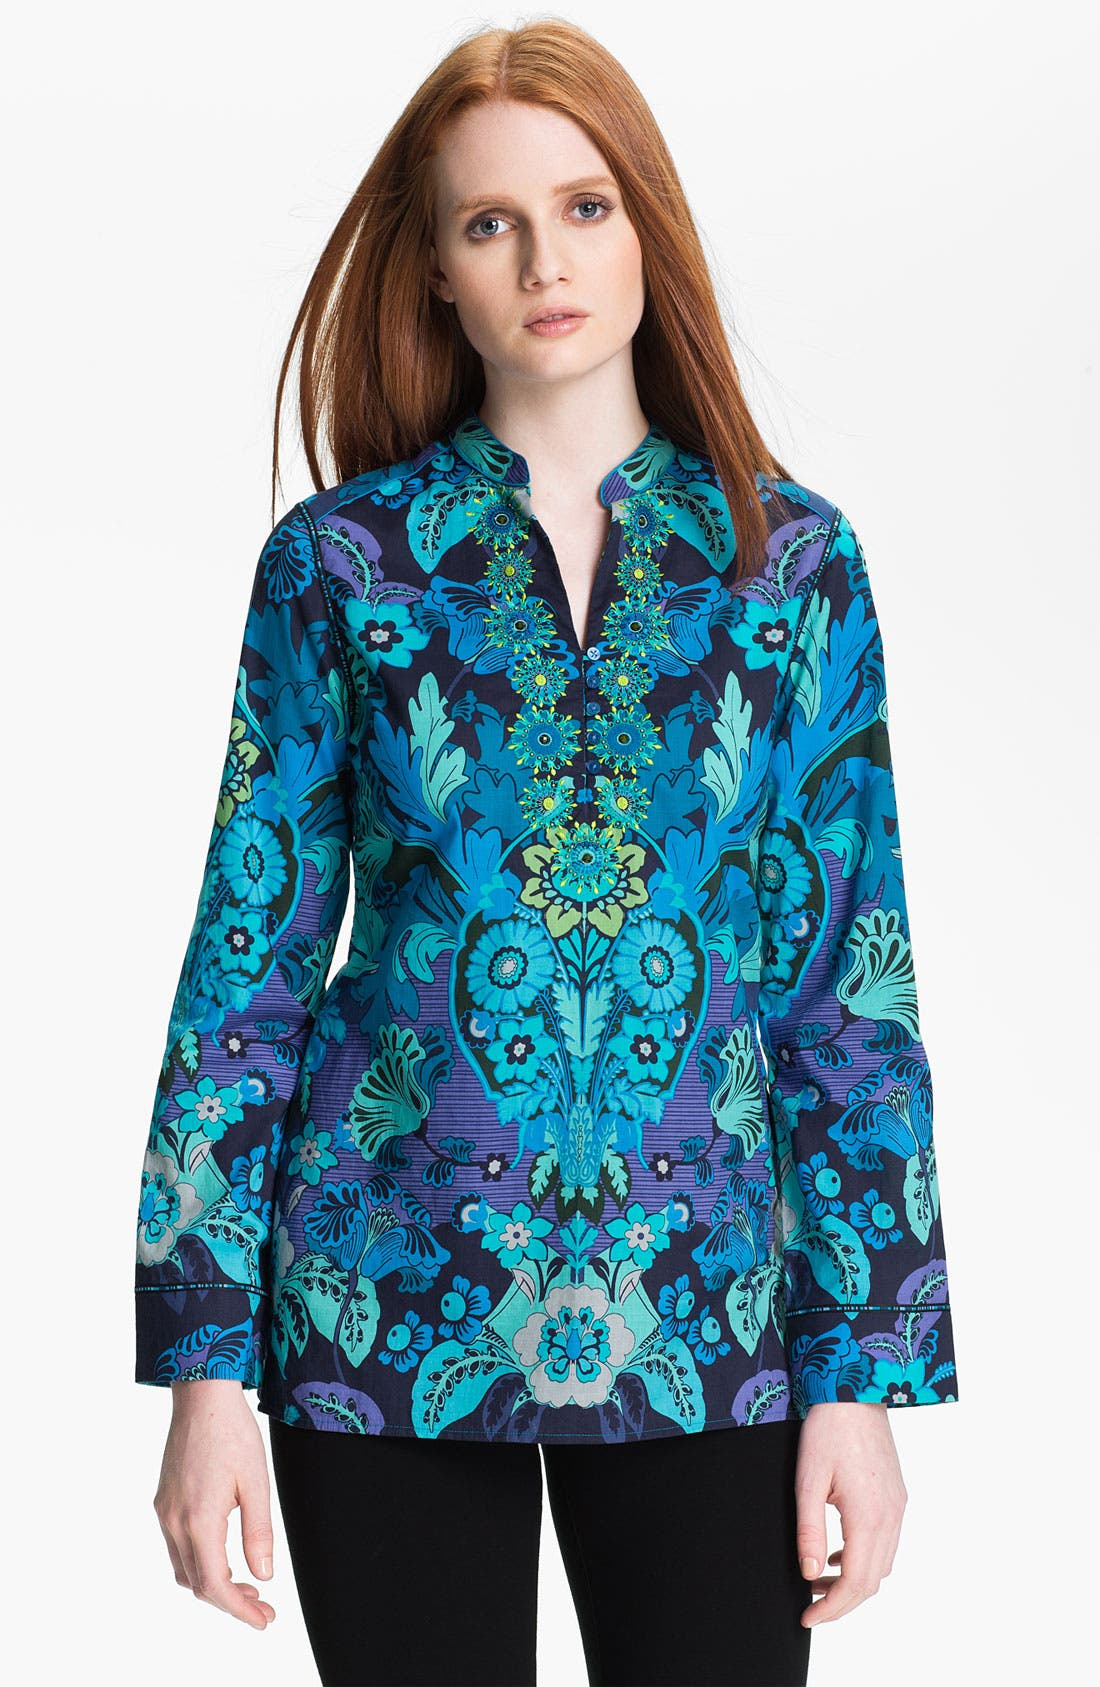 Alternate Image 1 Selected - Robert Graham 'Diane' Shirt (Online Exclusive)